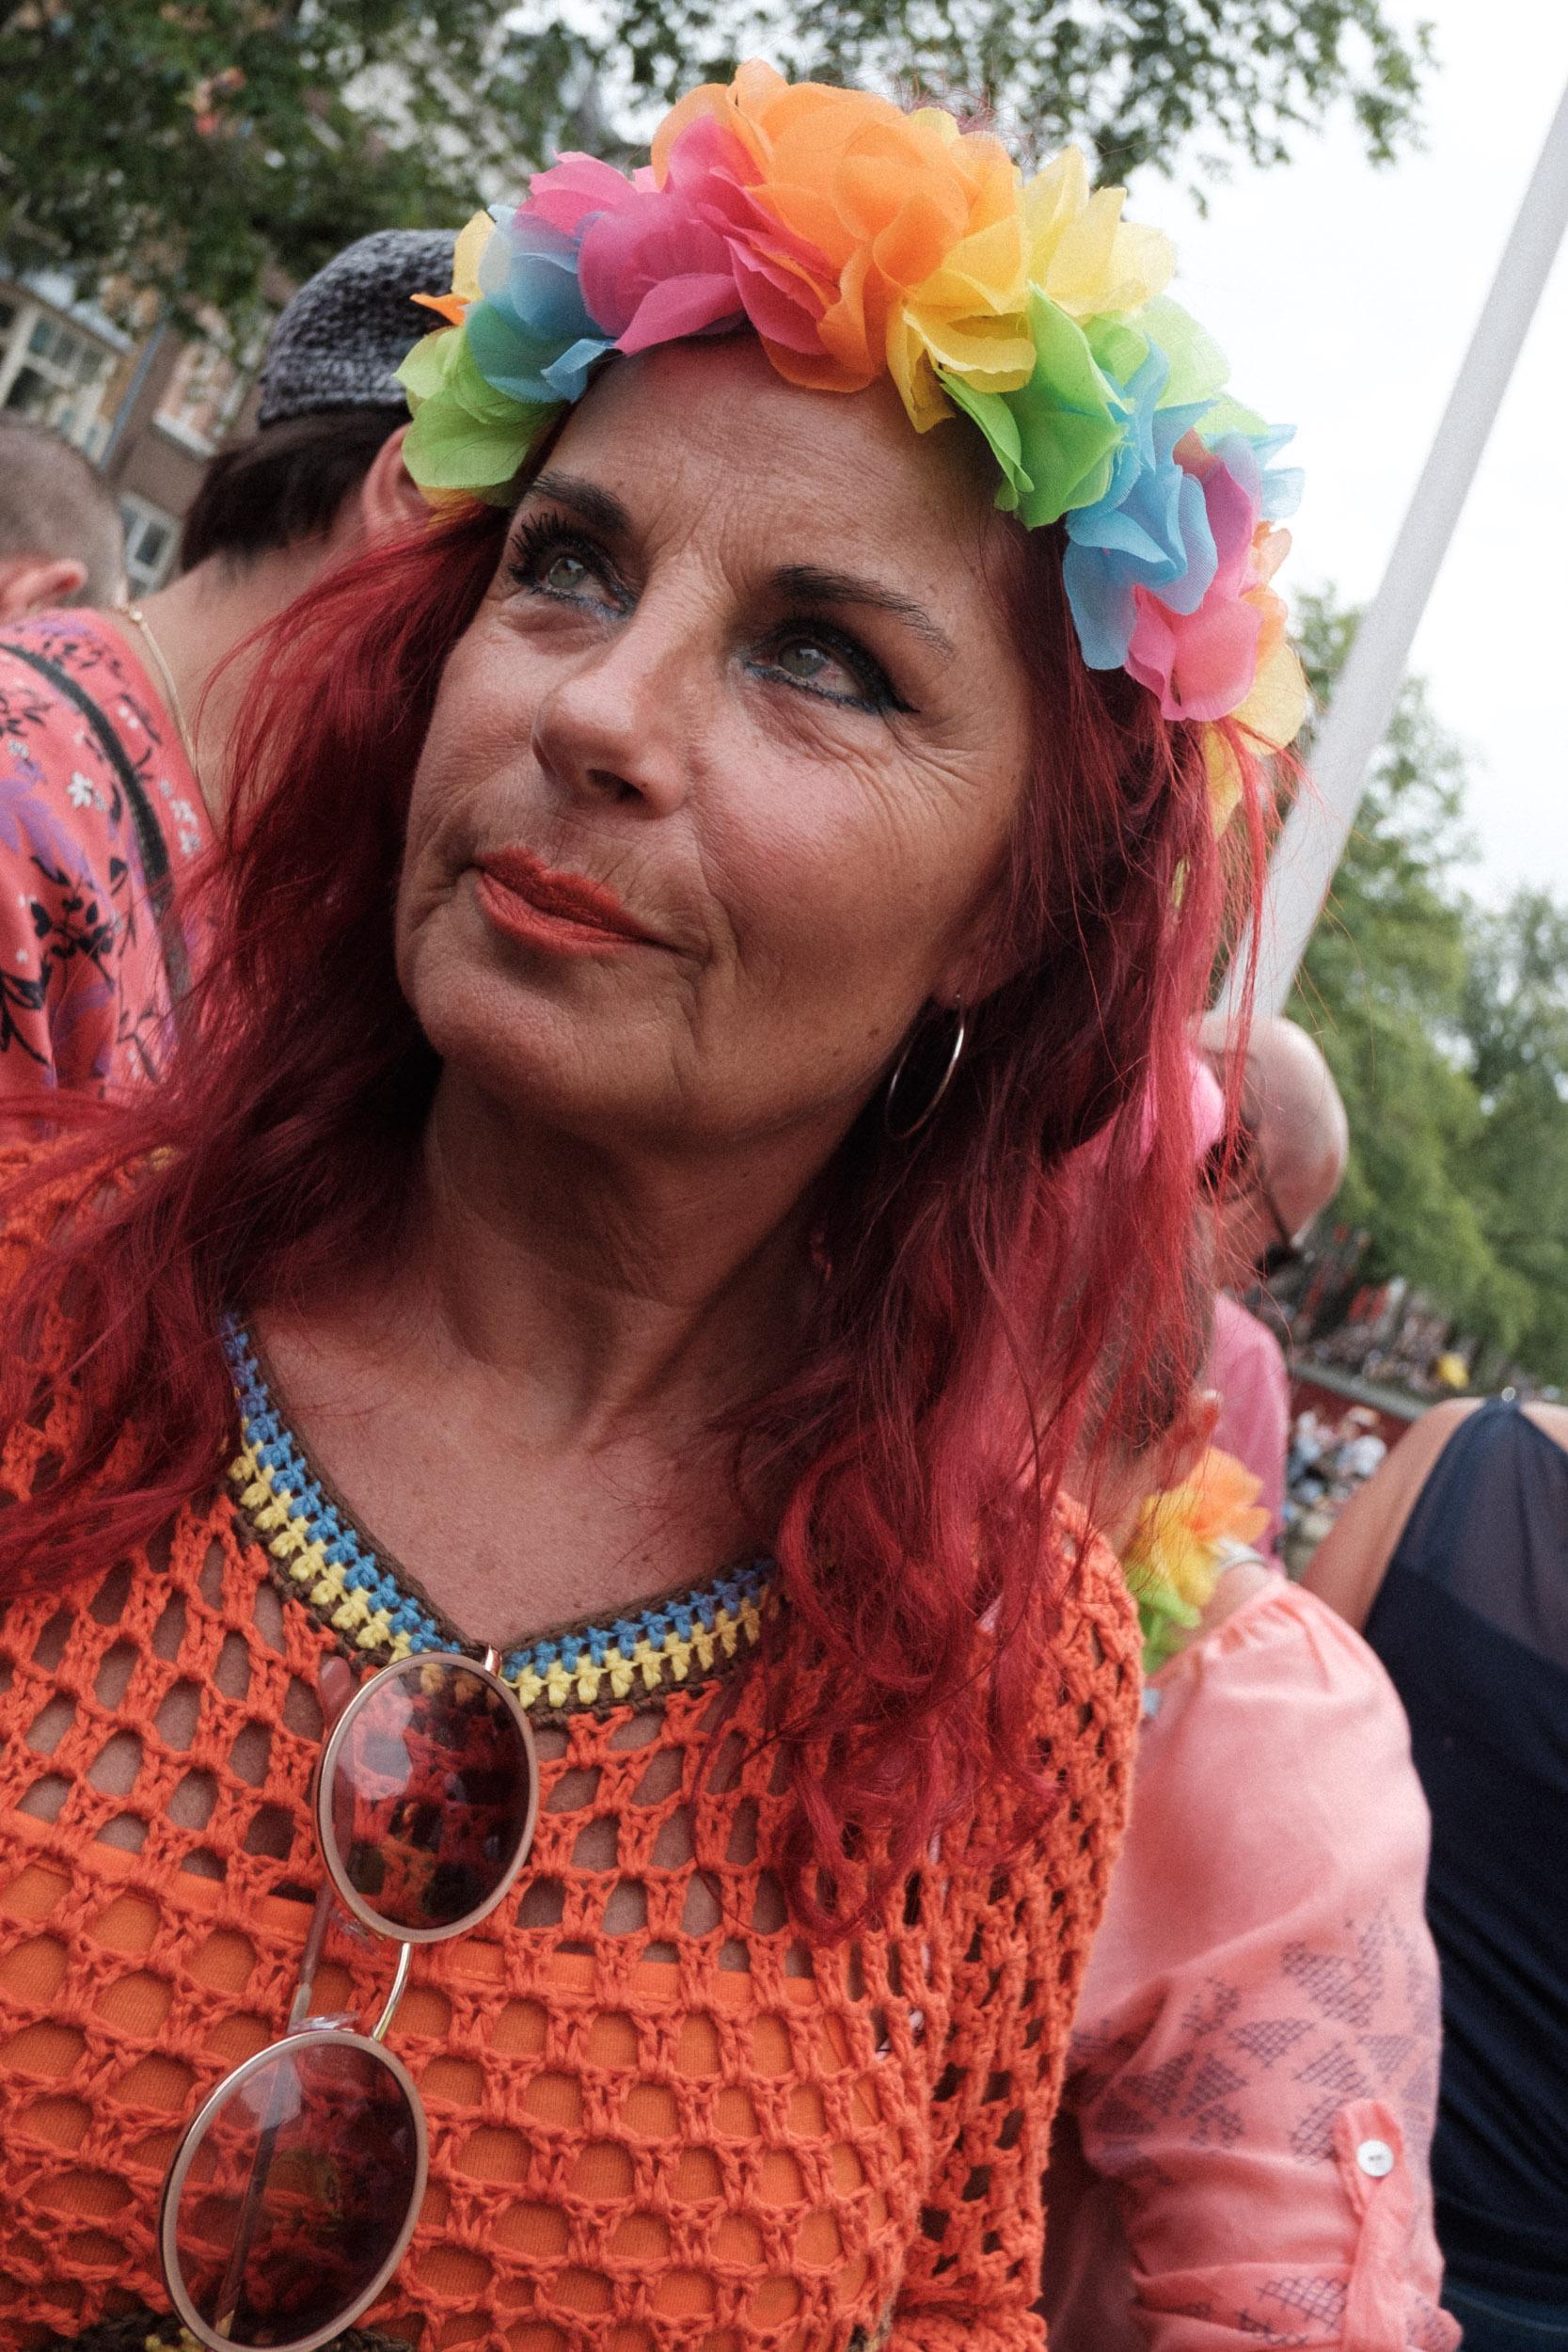 amsterdam-pride-31.jpg